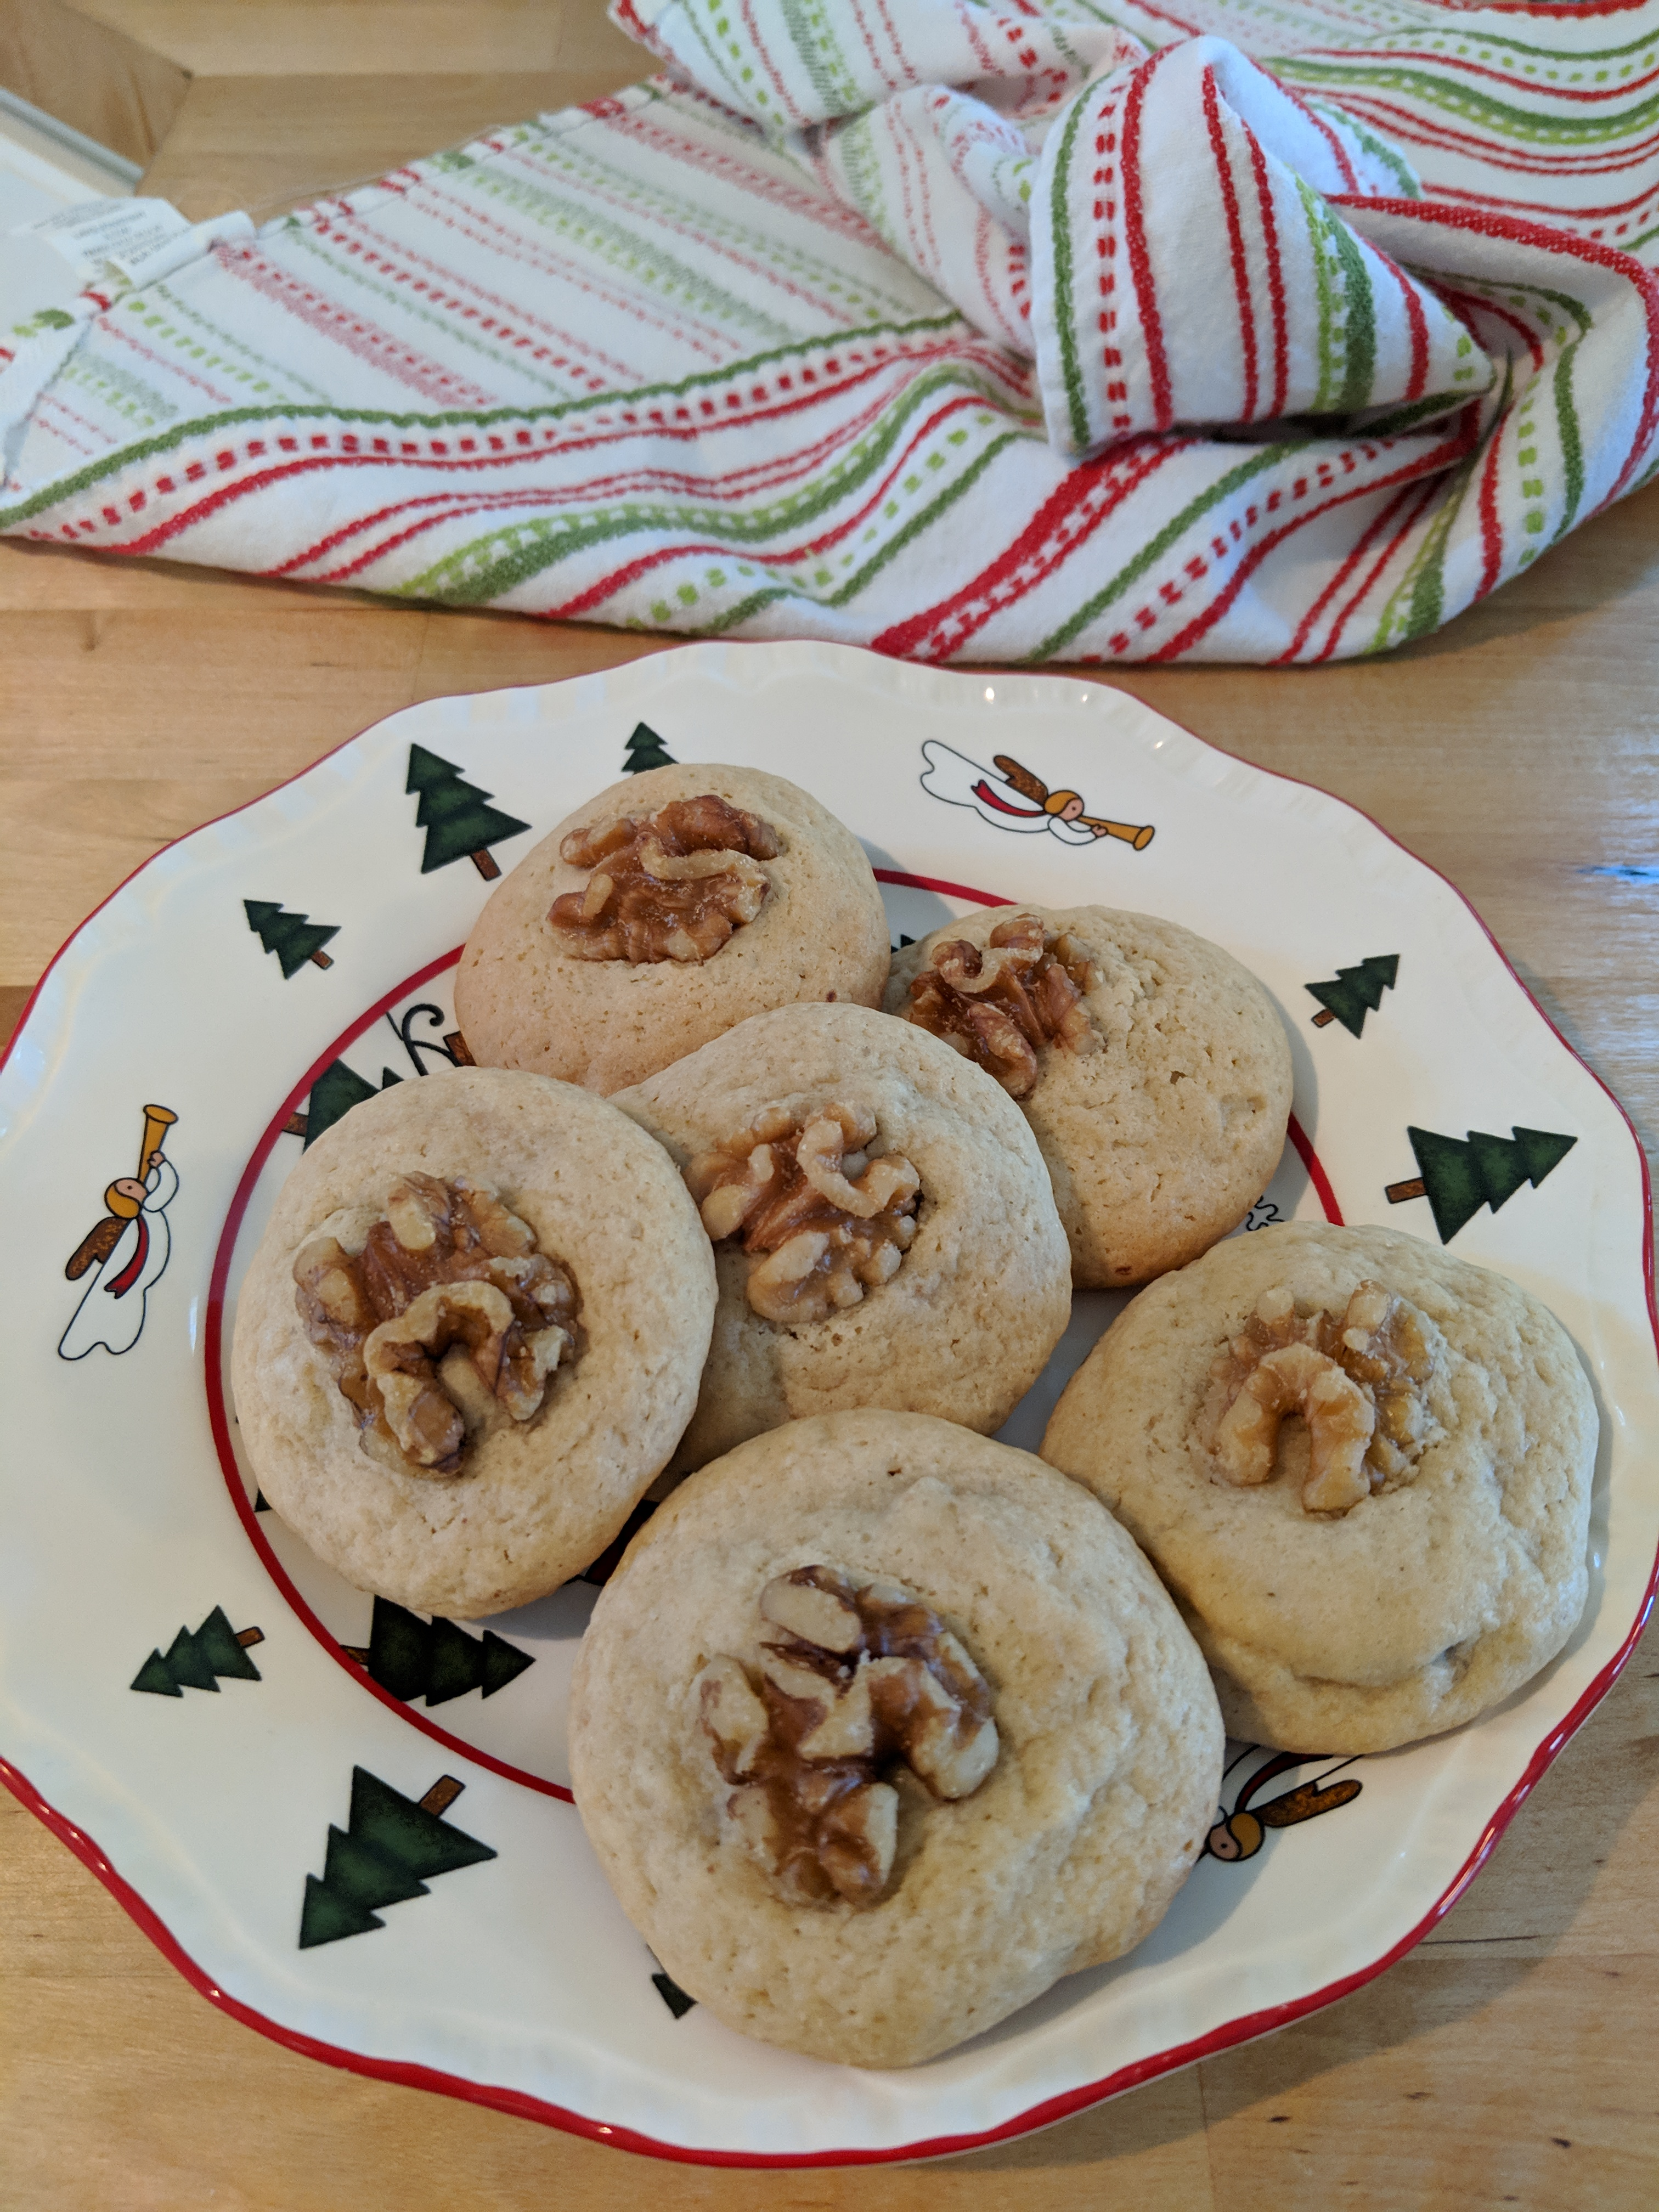 Starlight Mint Surprise Cookies Kathy Blacklock